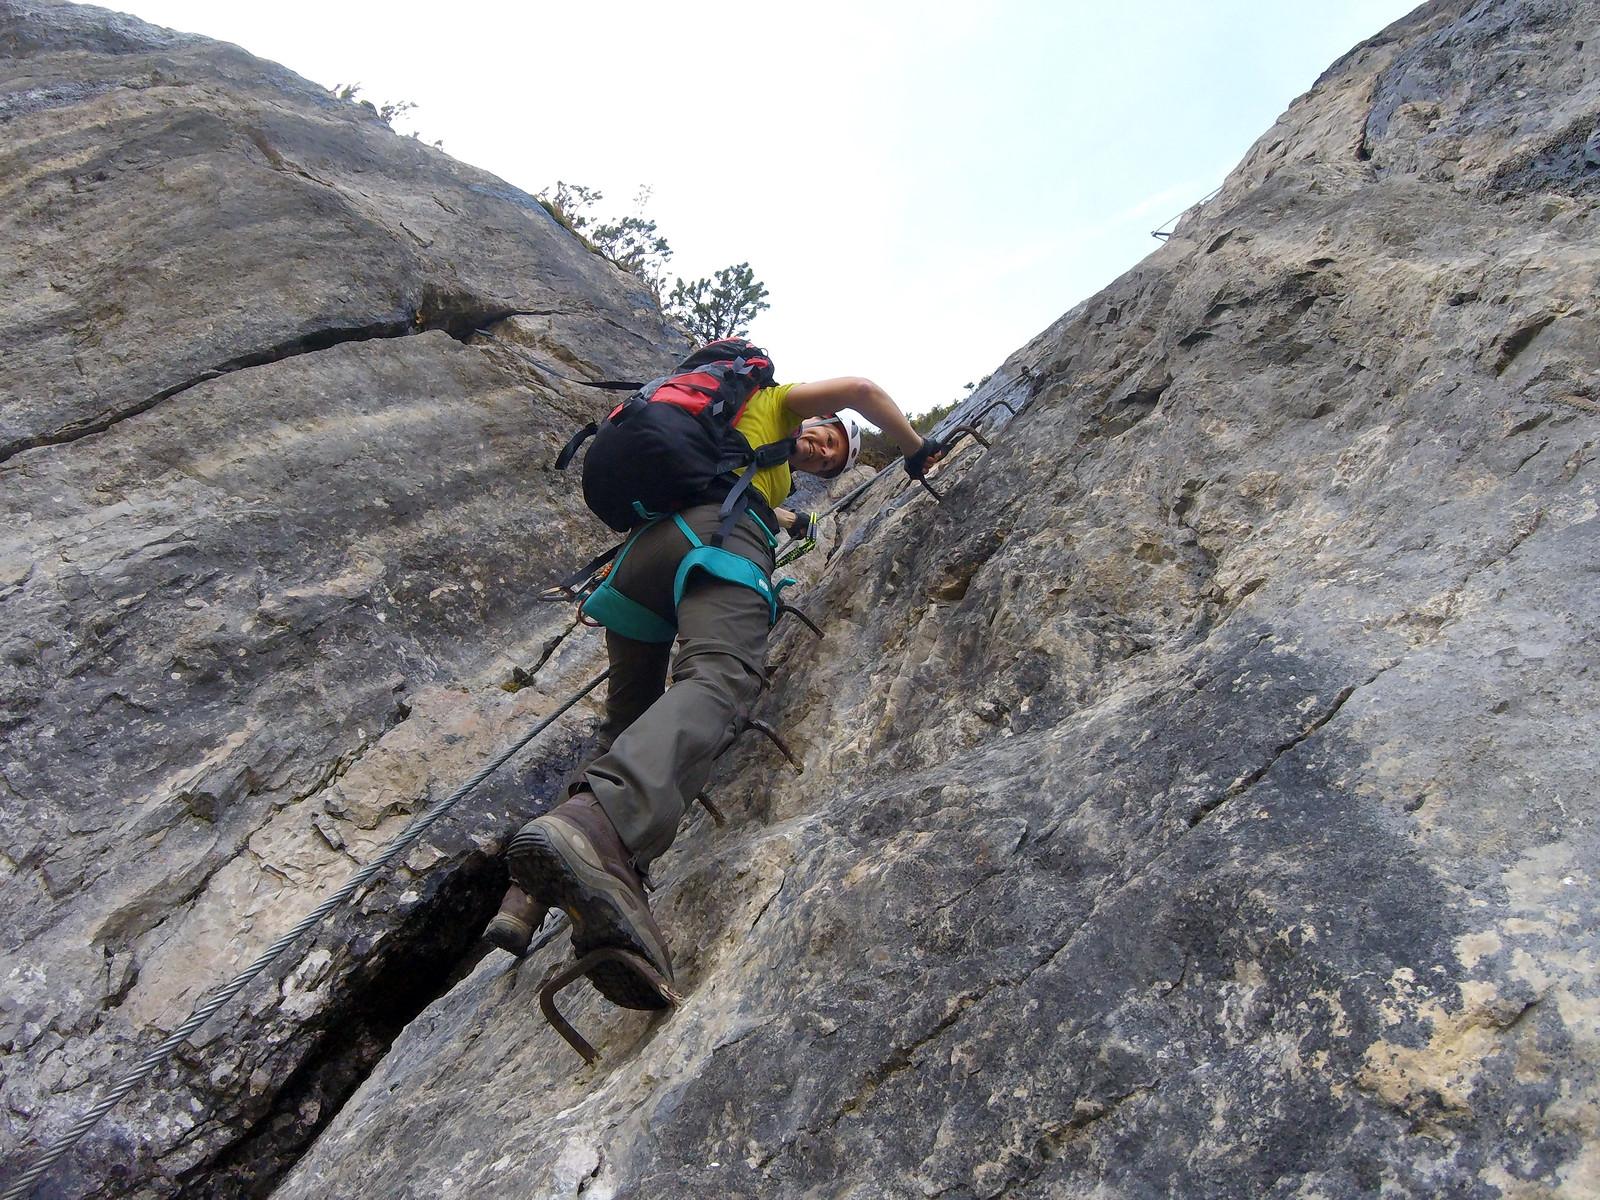 Klettersteig Kanzelwand : Gesicherter nervenkitzel klettersteige immer beliebter n tv